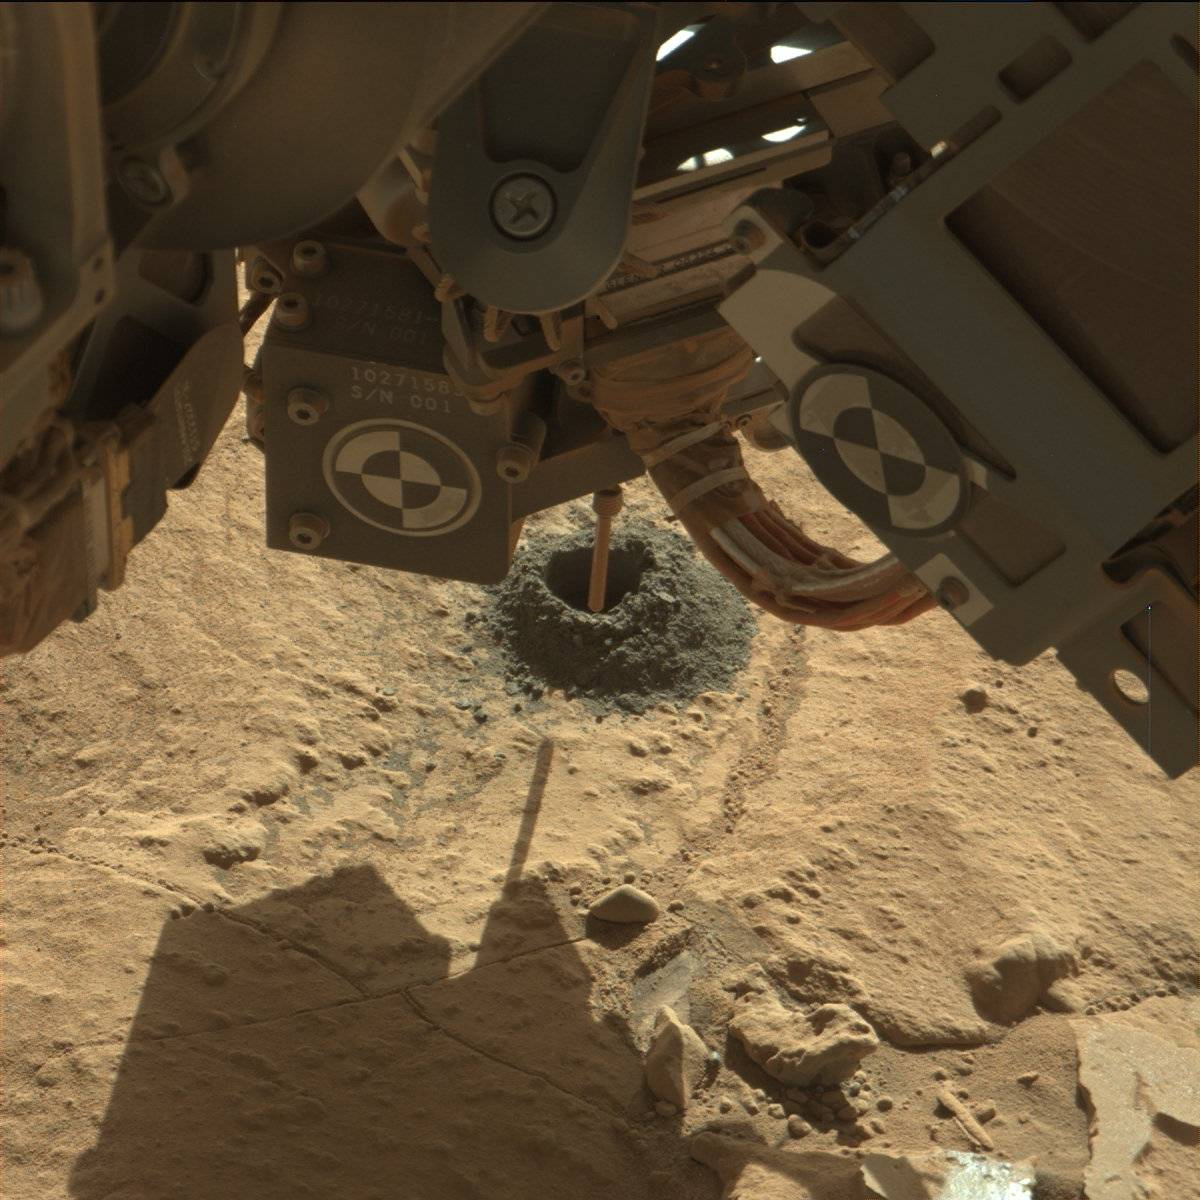 mars rover drill status - photo #11